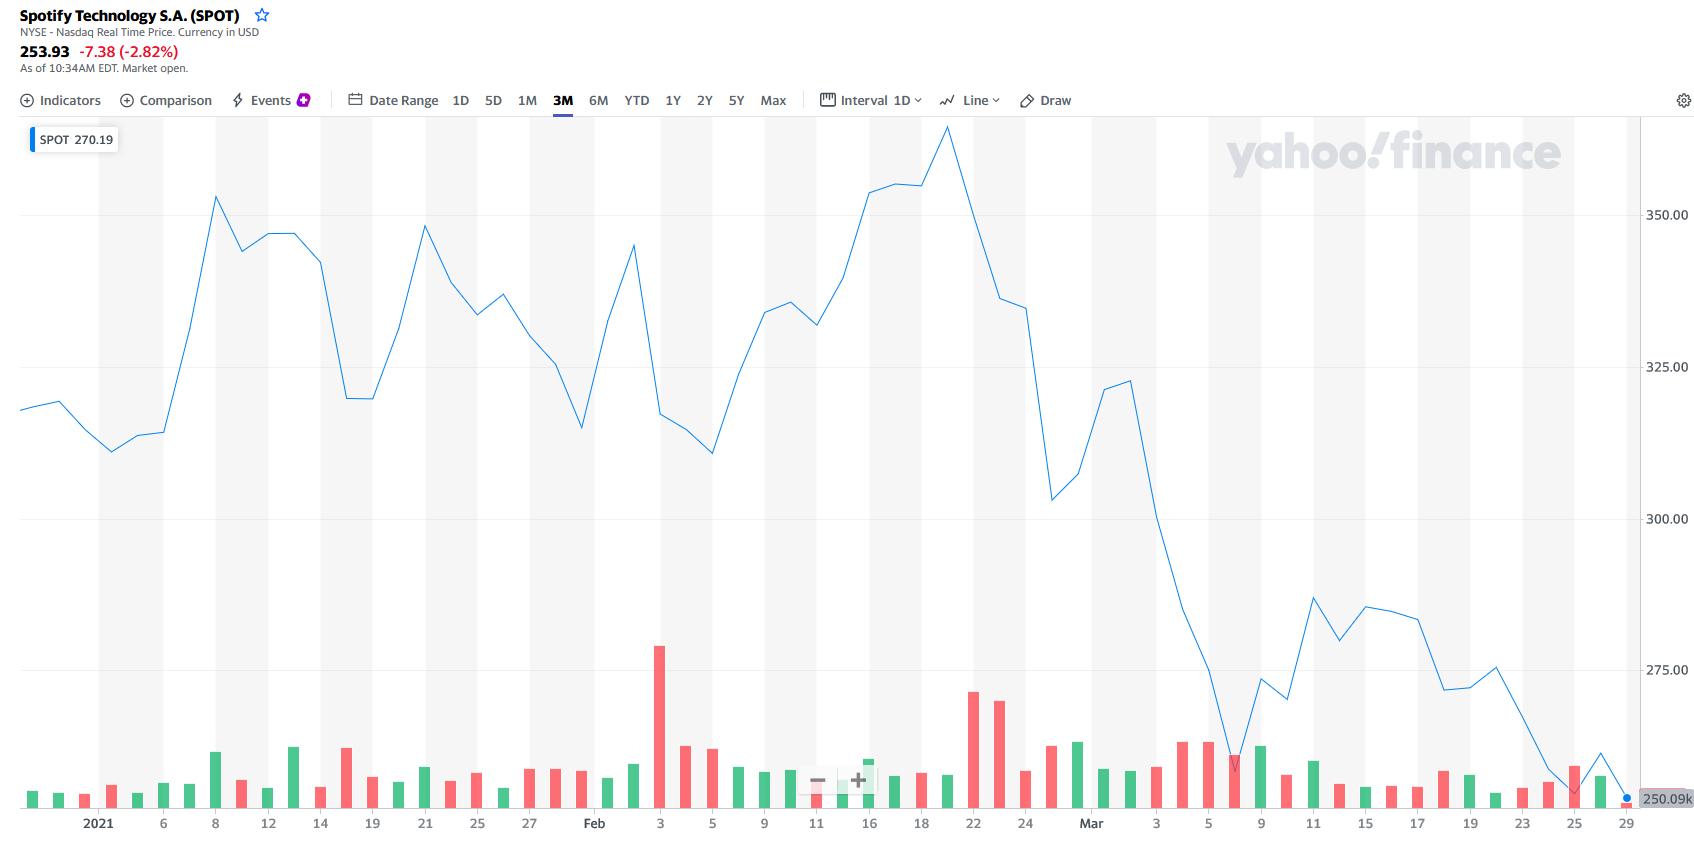 spotify_stock-202012-202103.jpg